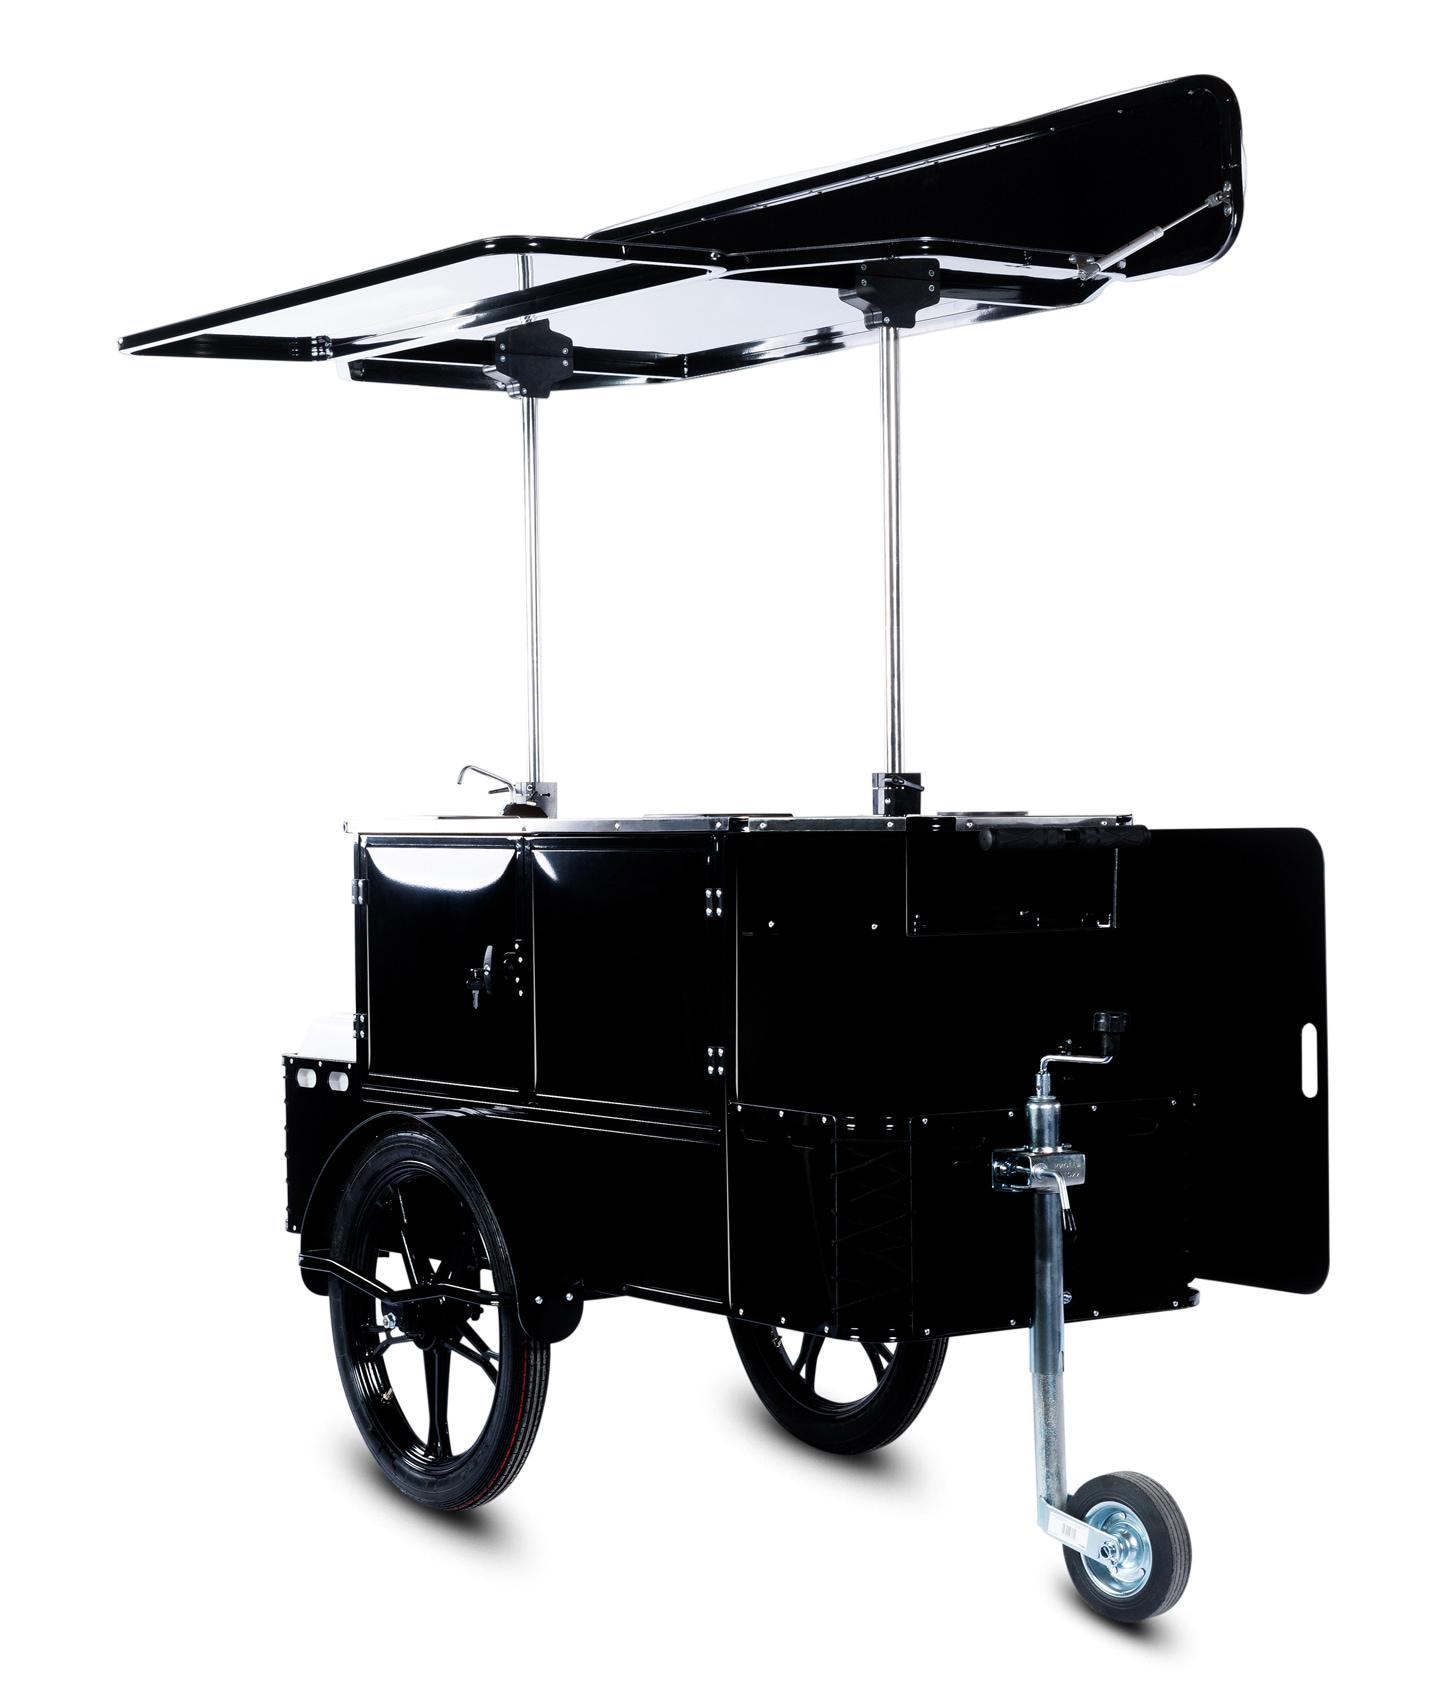 Bizz On Wheels basic coffee cart side view